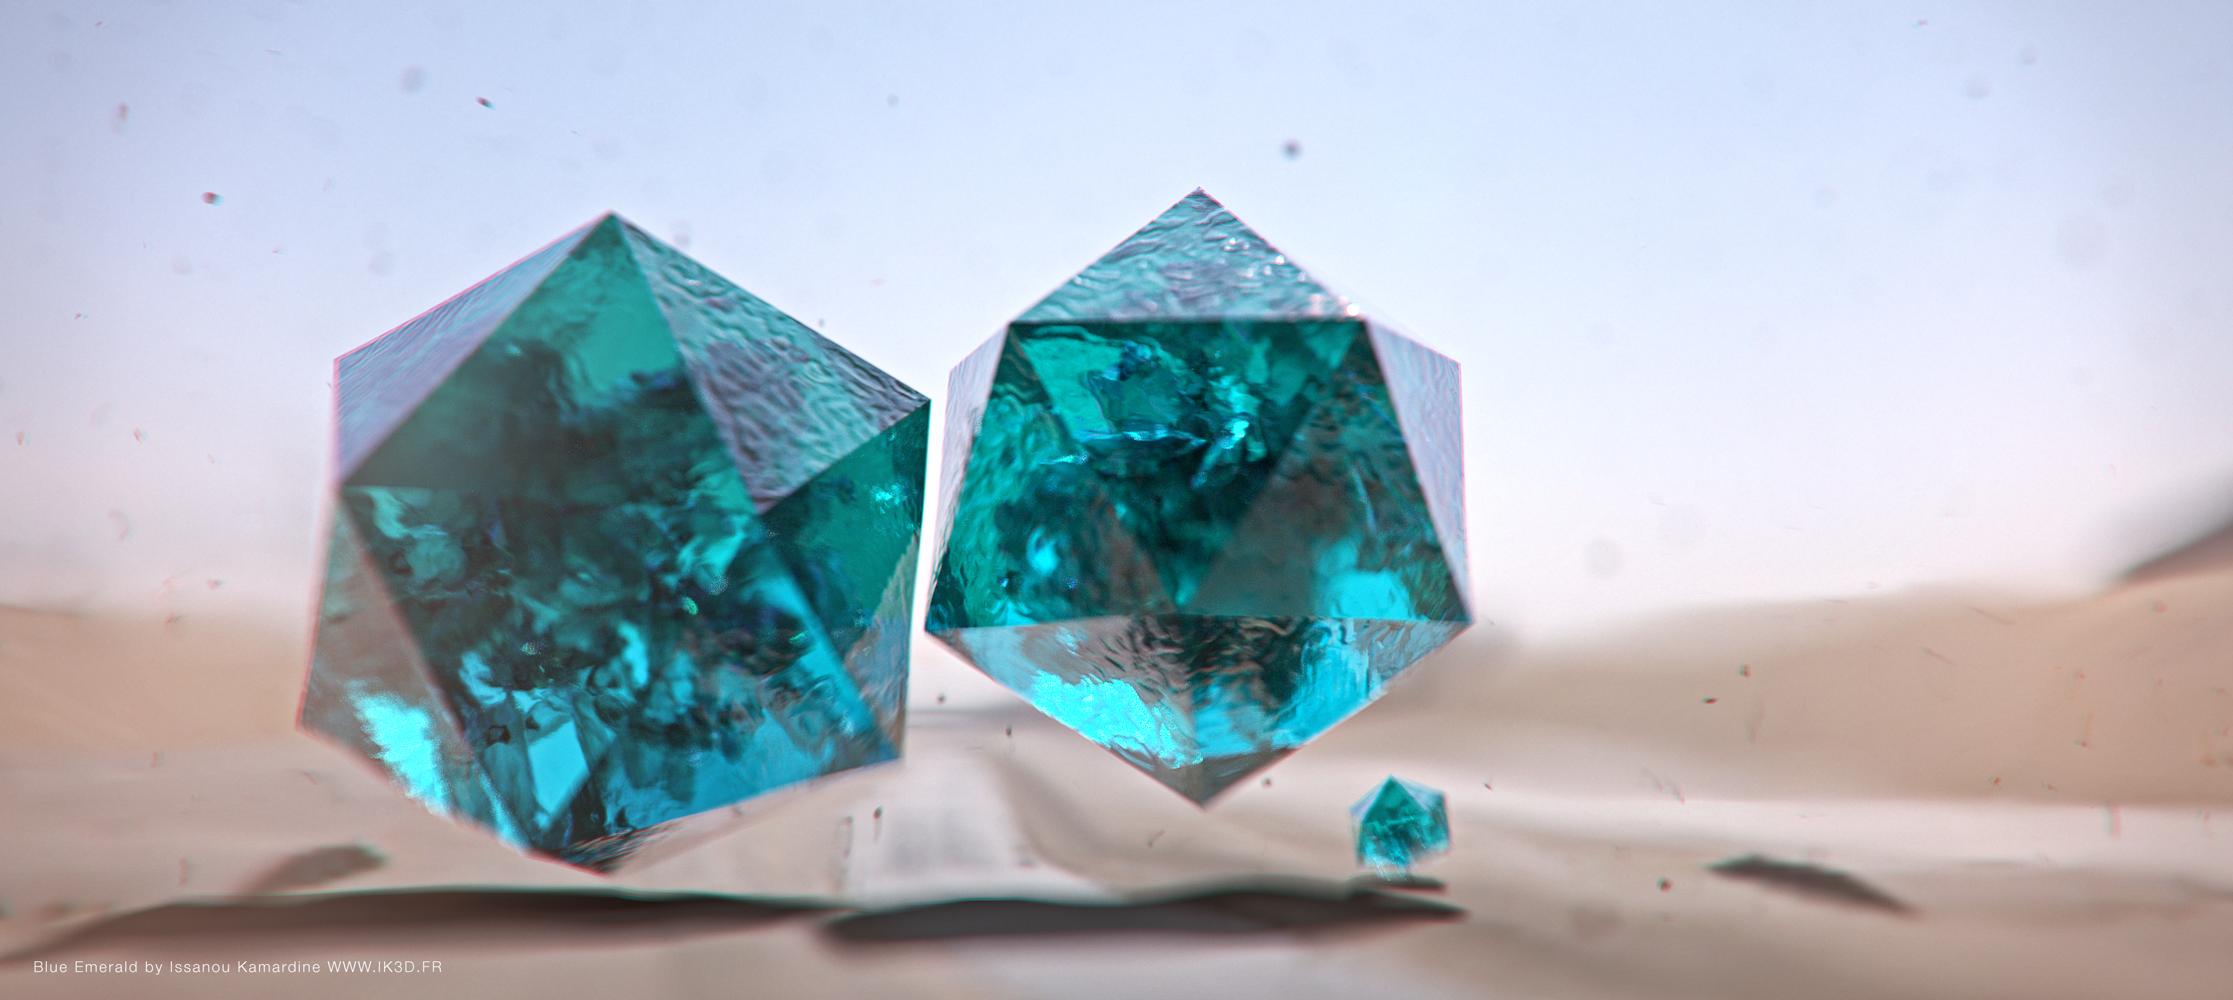 Blue Emerald